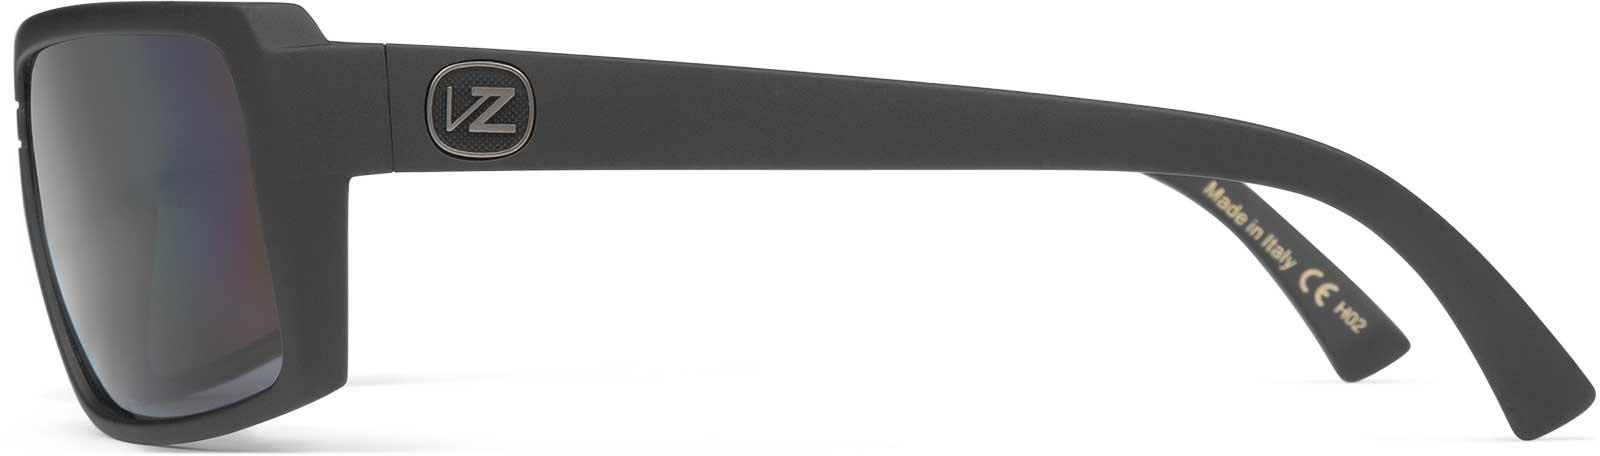 b0c23750dd Von Zipper Snark Wildlife Polarized Plus Sunglasses Mens